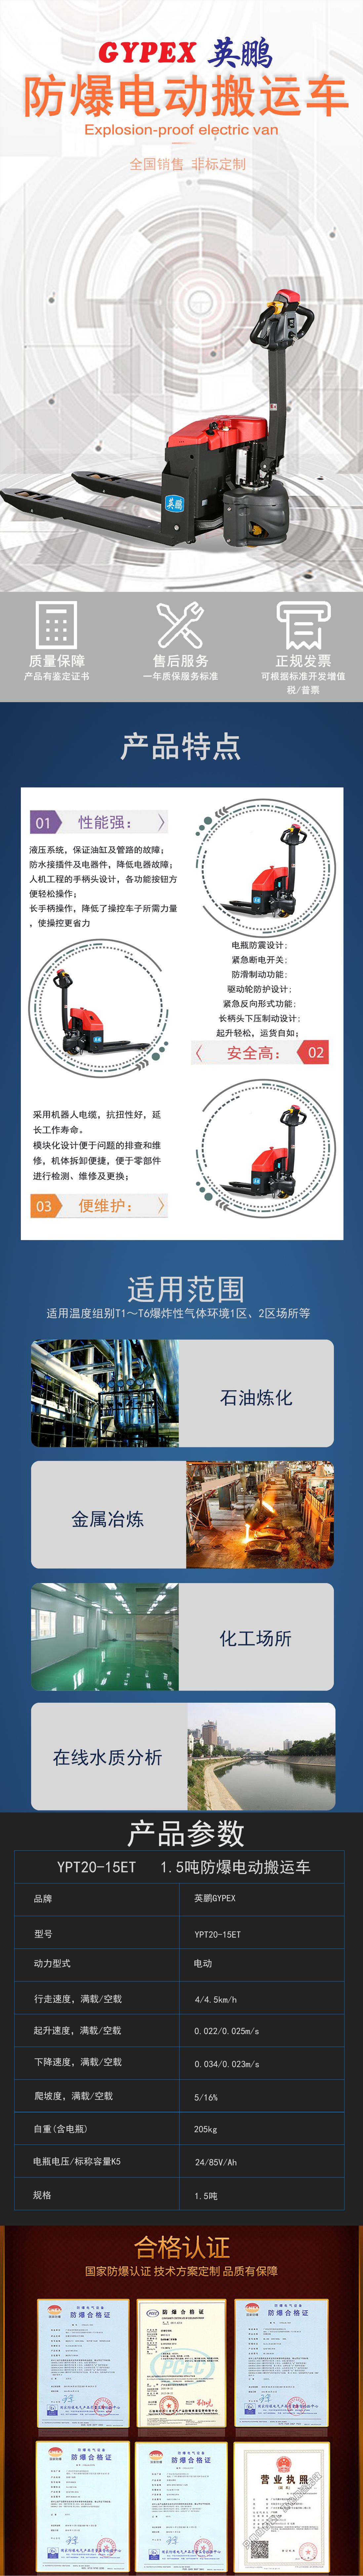 YPT20-15ET電動搬運車詳情圖.jpg